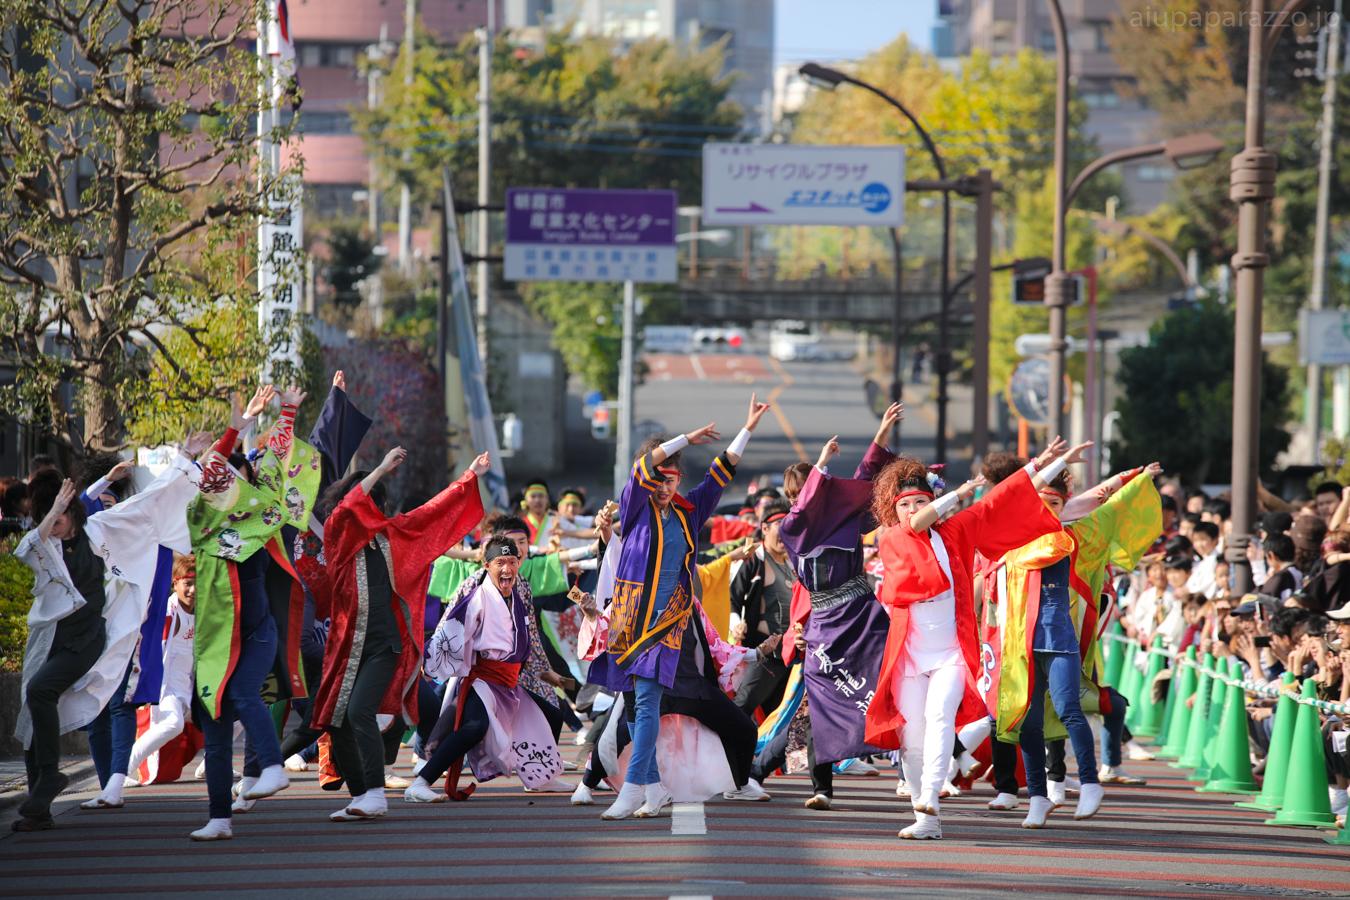 kanpachi2016oyachai-3.jpg